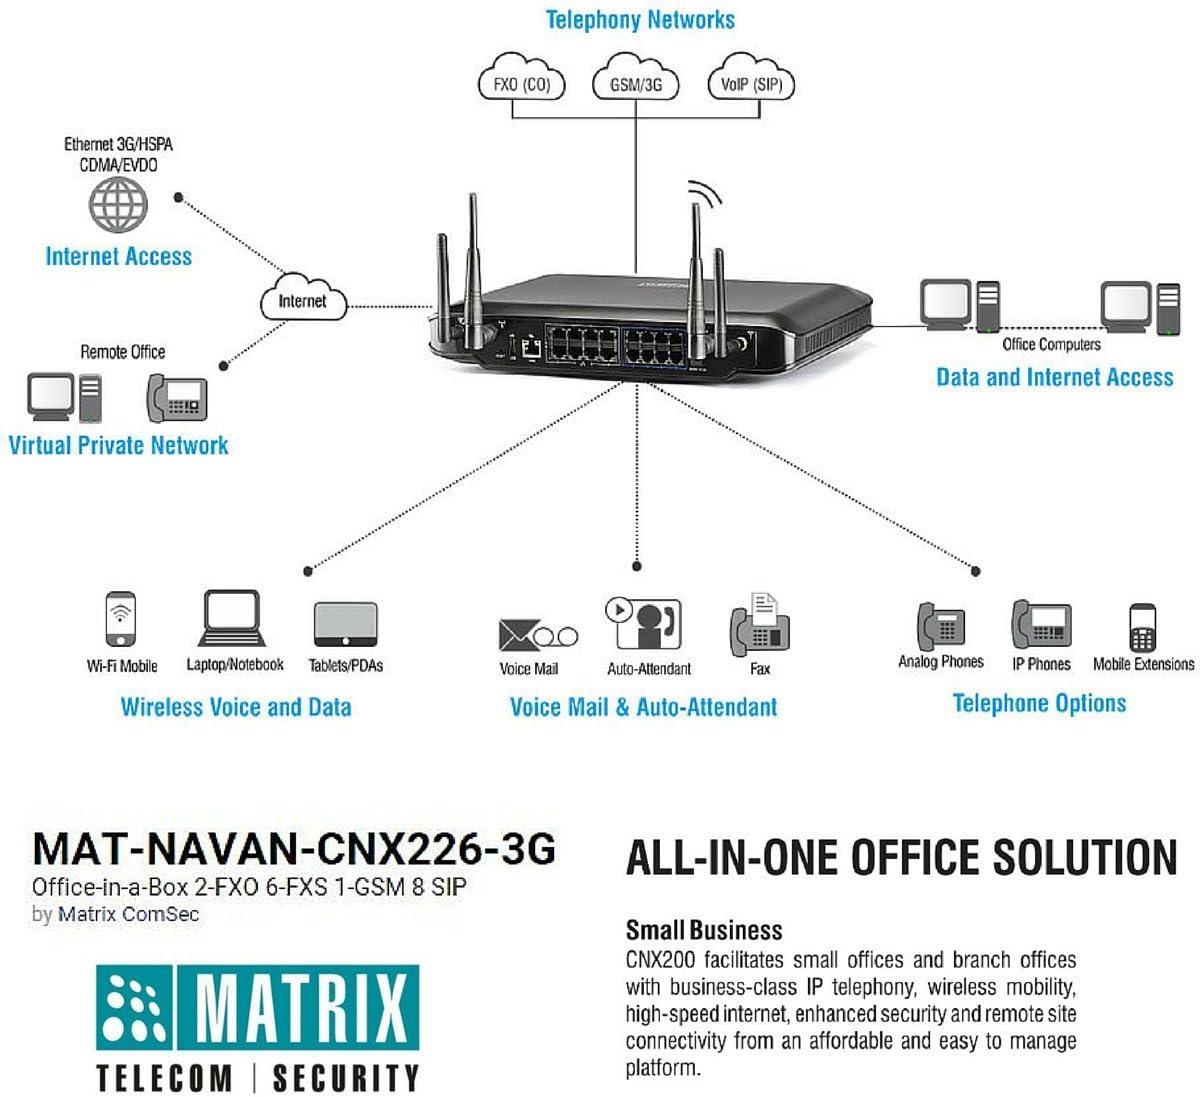 Matrix ComSec NAVAN-CNX226-3G Office-in-a-Box New sales 6-FXS 1-GSM 2-FXO OFFer